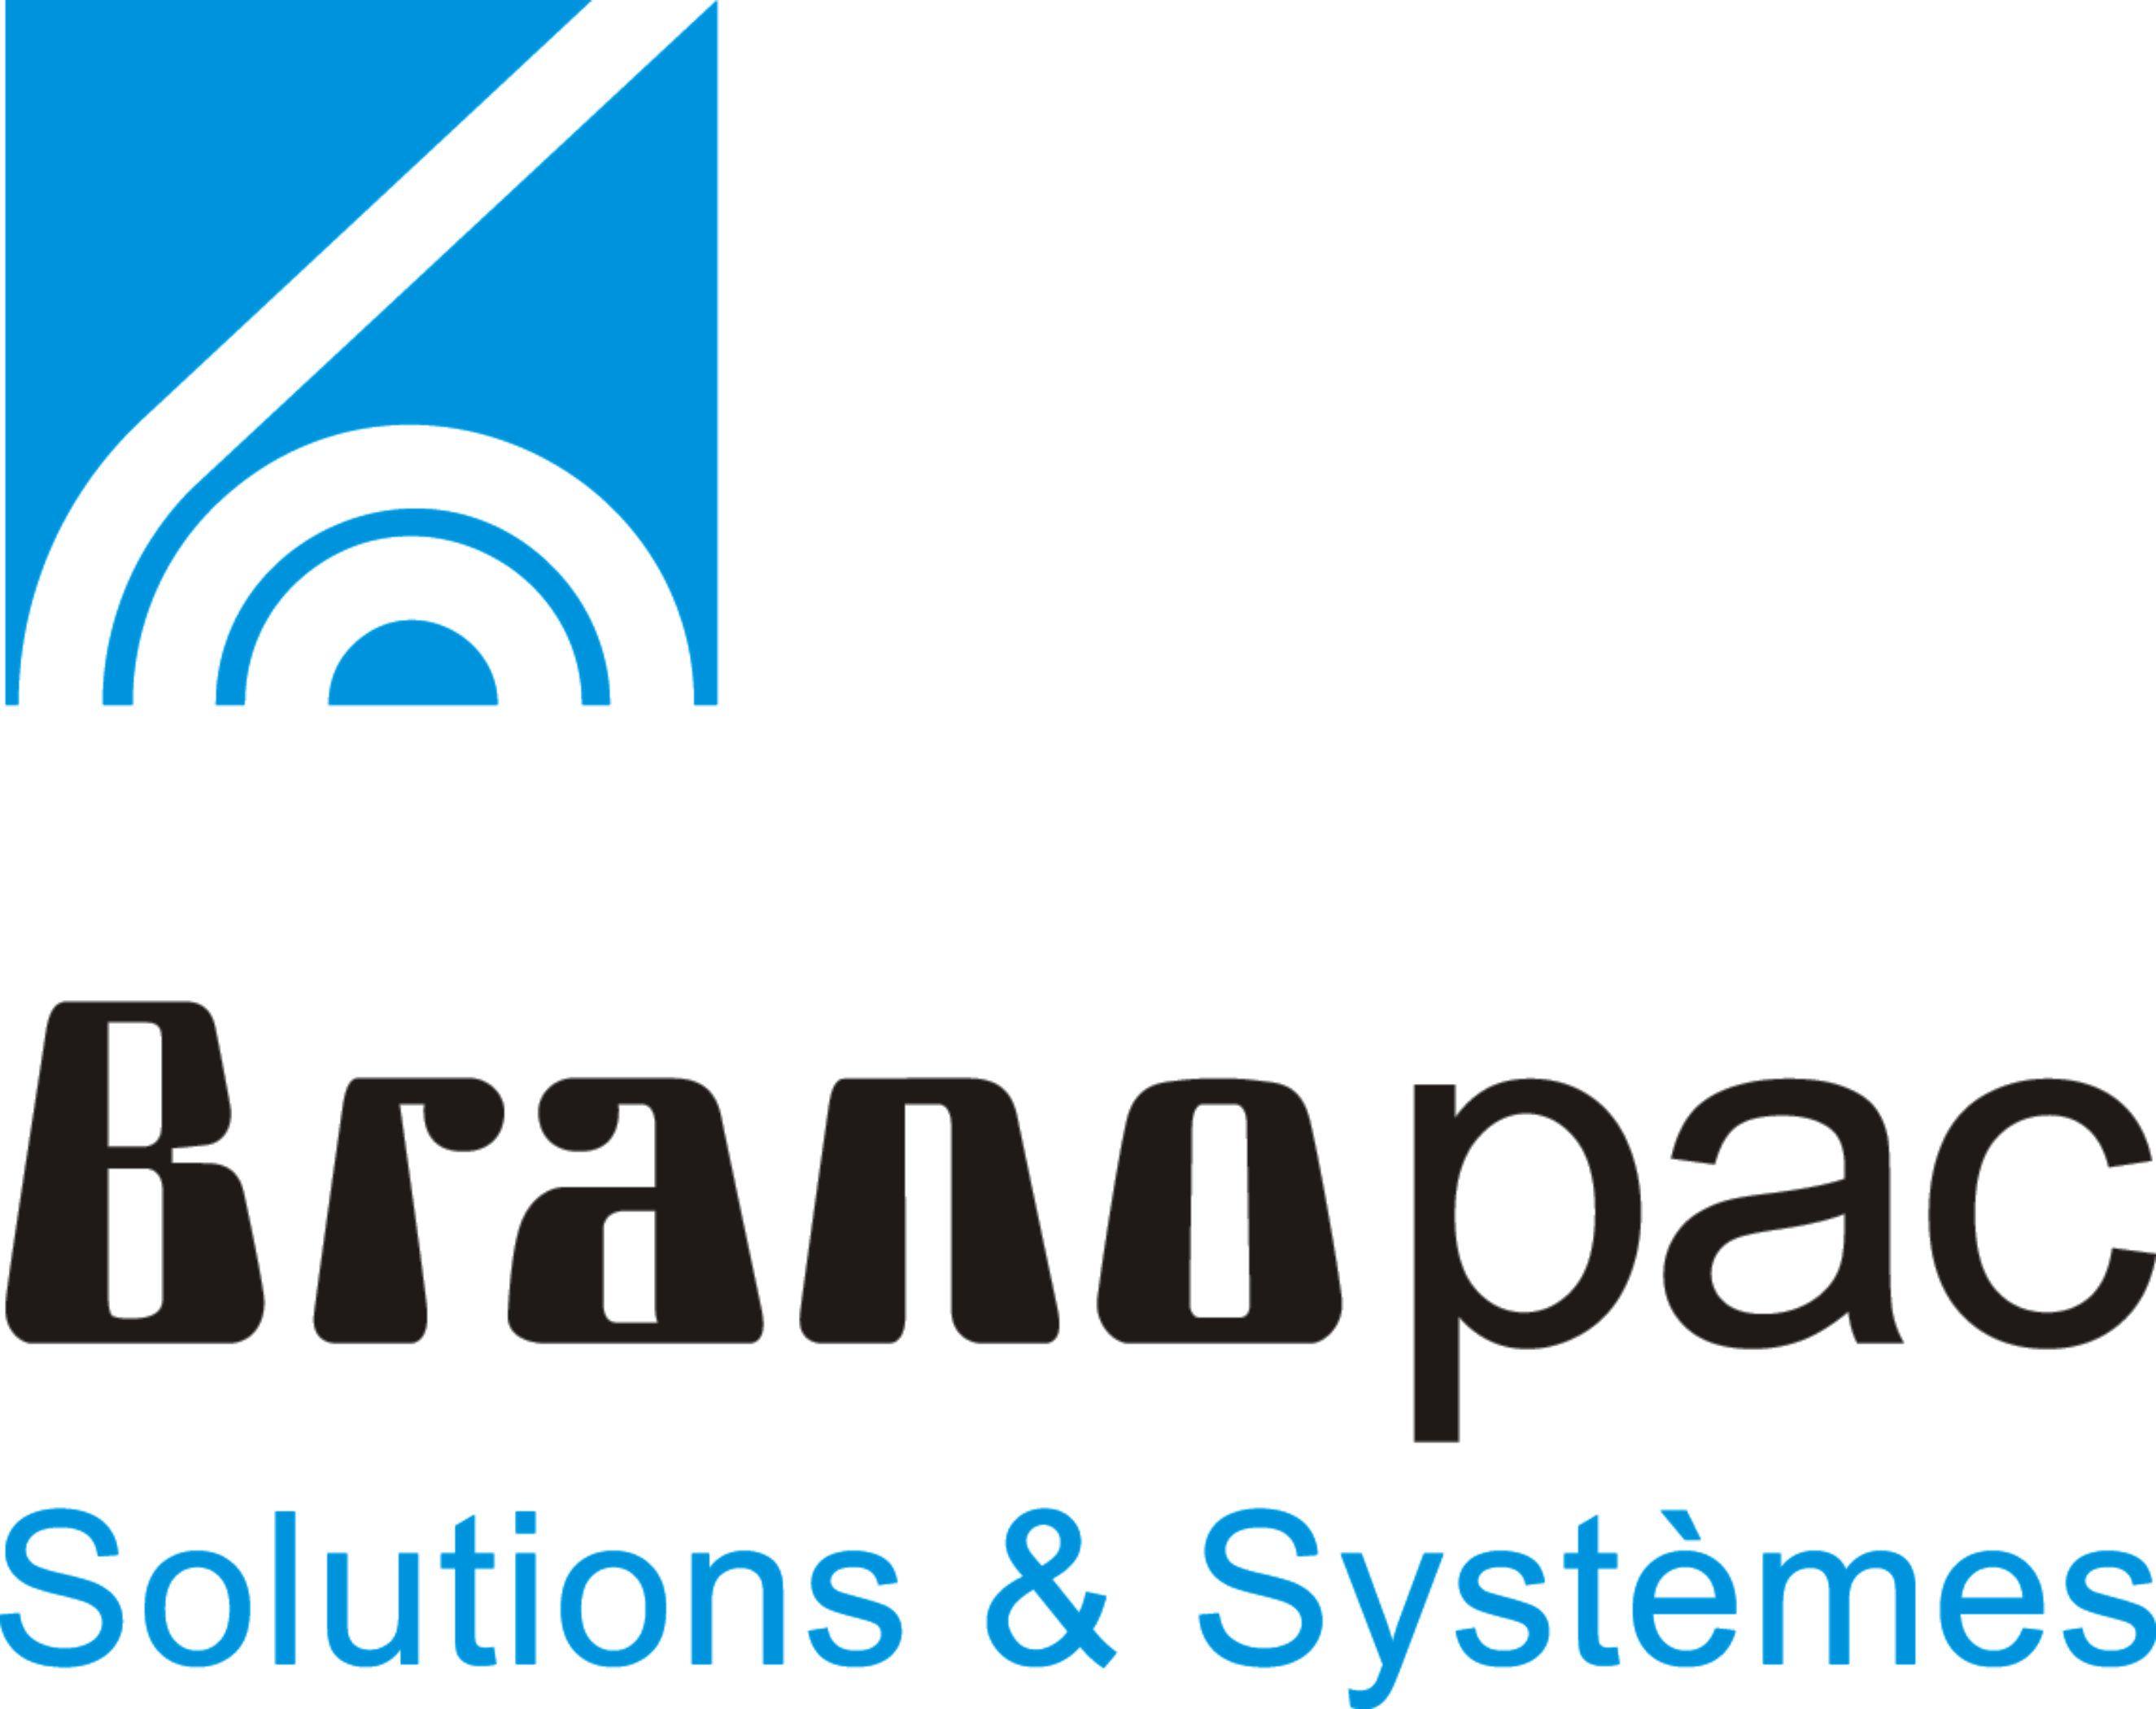 Branopac France